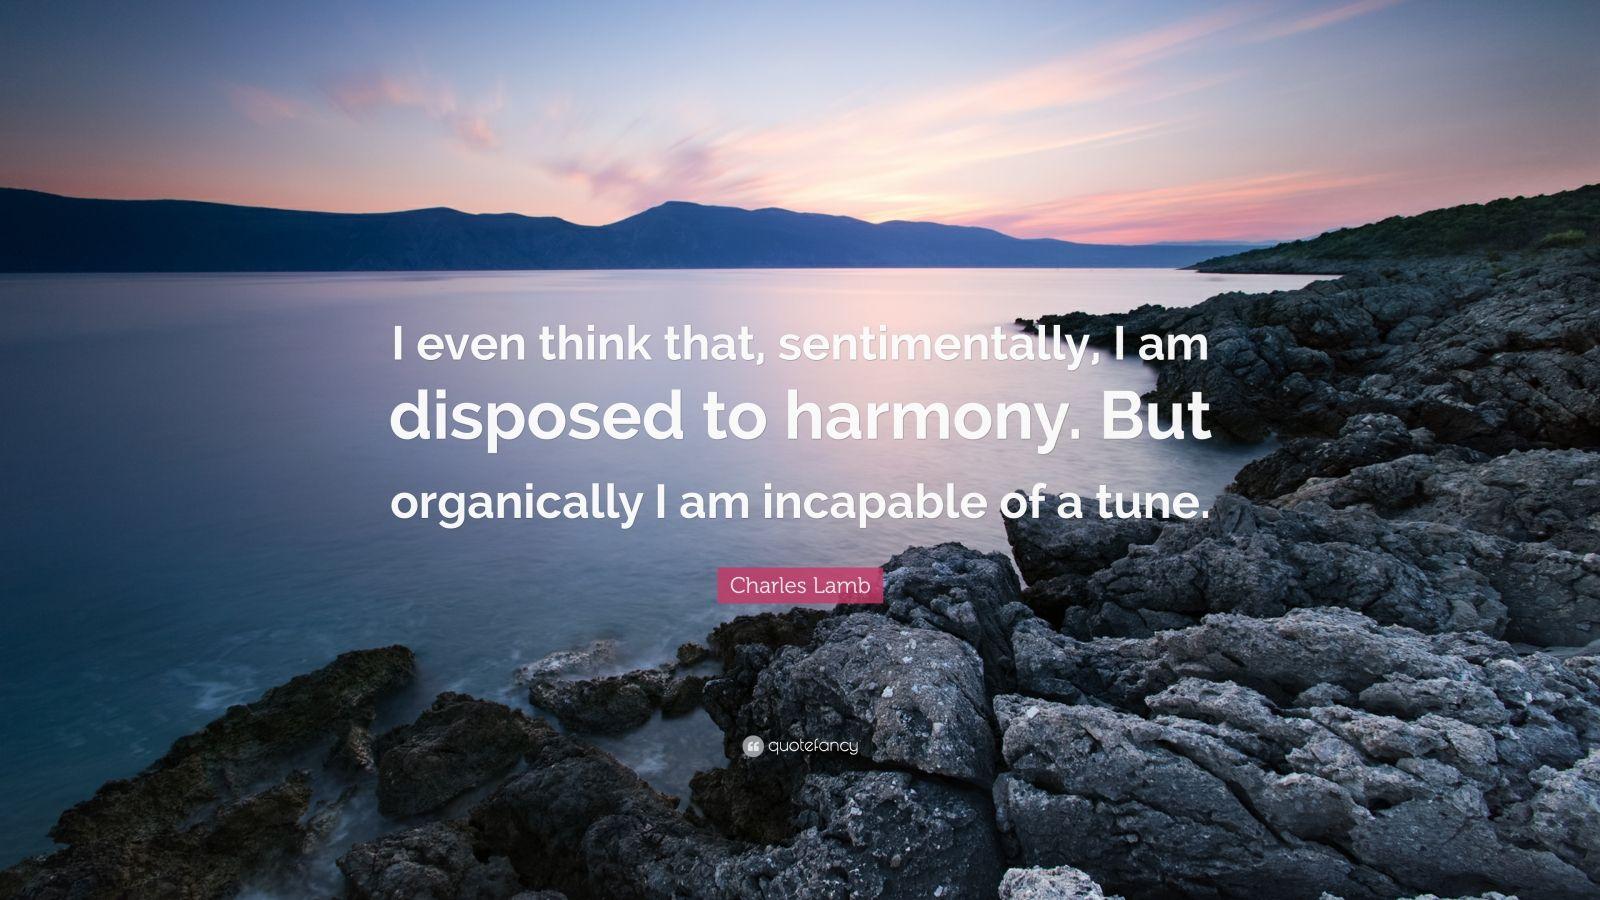 Think Sentimentally